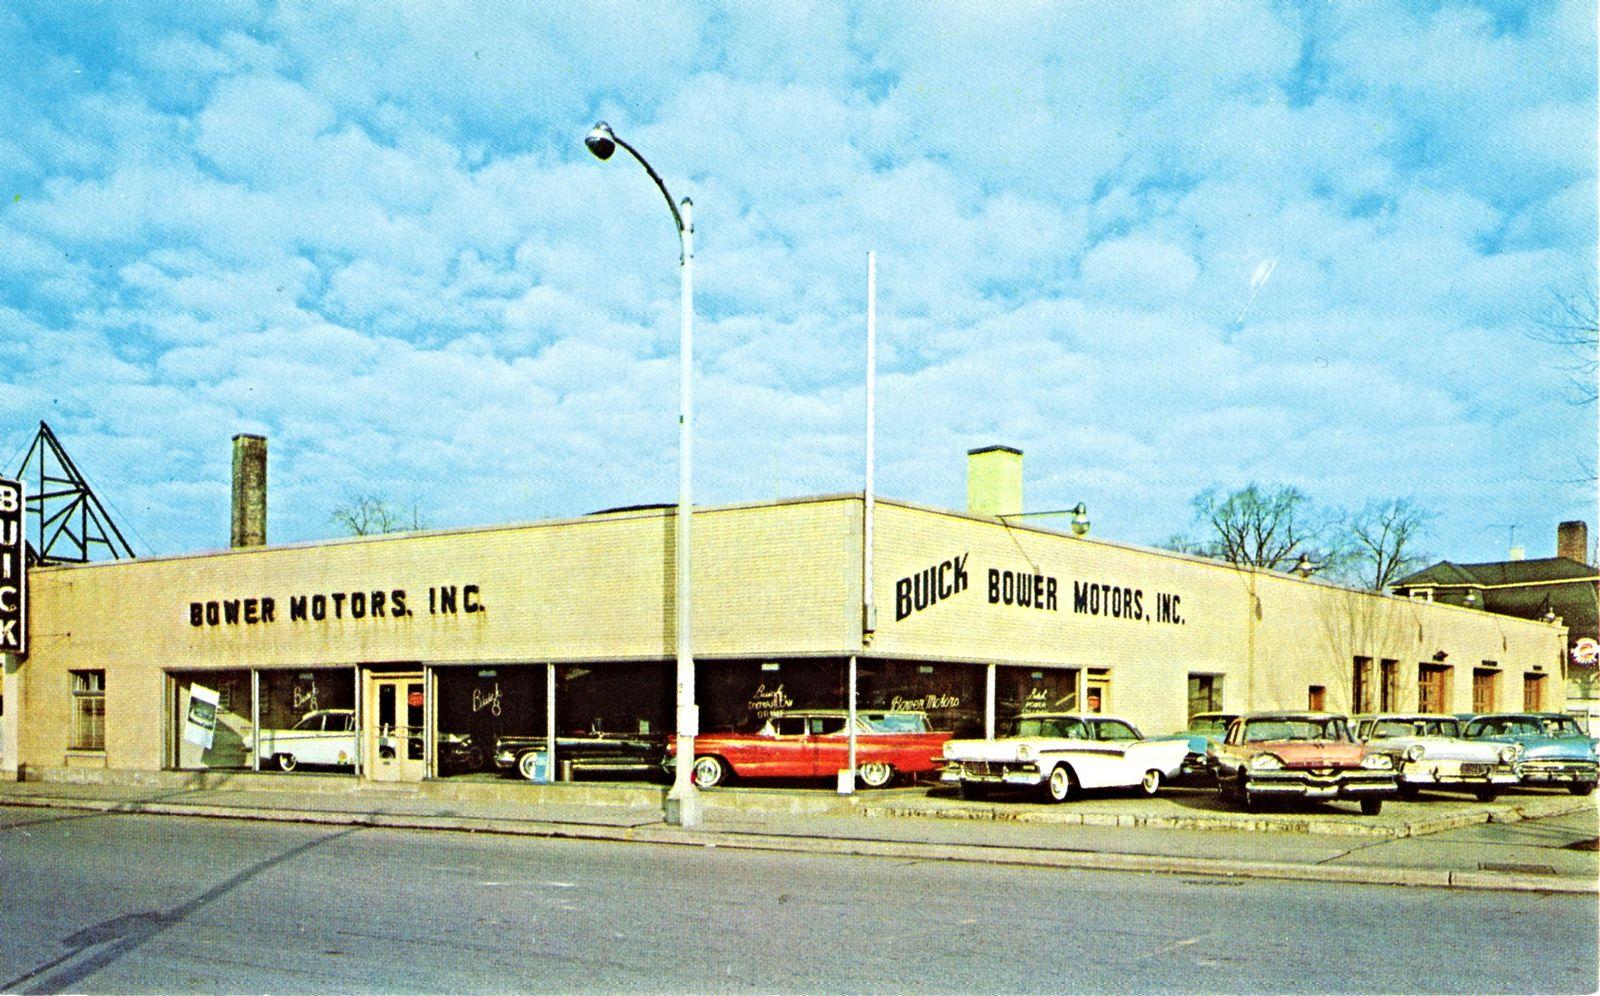 Bower Motors Inc Buick La Grange Il 1959 Buick Car Dealership Buick Cars